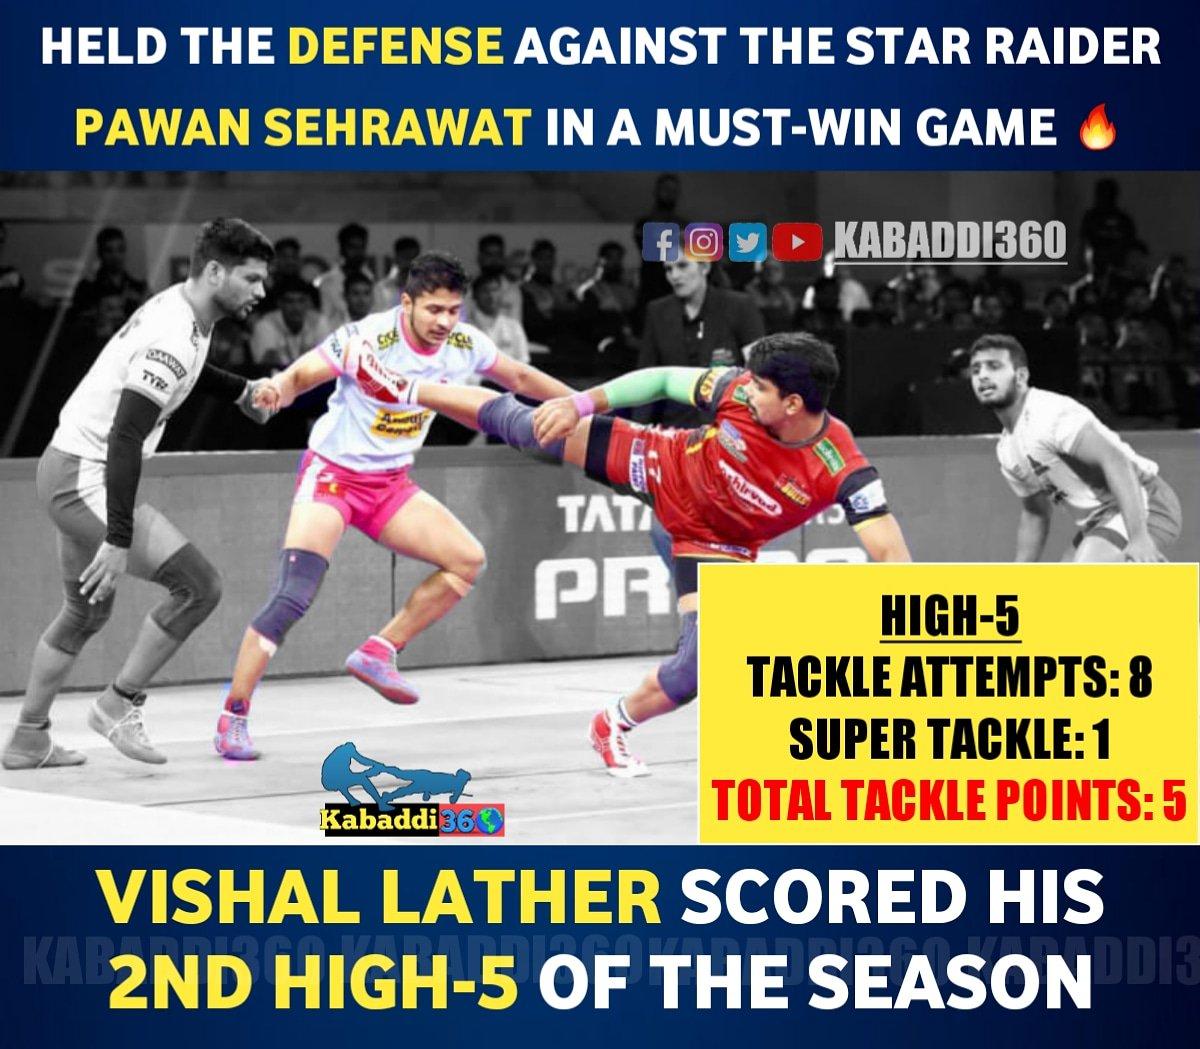 When the other defenders had a rough day tonight, a matured performance from Vishal Lather saved Jaipur Pink Panthers.   #VishalLather #JaipurPinkPanthers #JAIvBLR #IsseToughKuchNahi #PKLwithKabaddi360